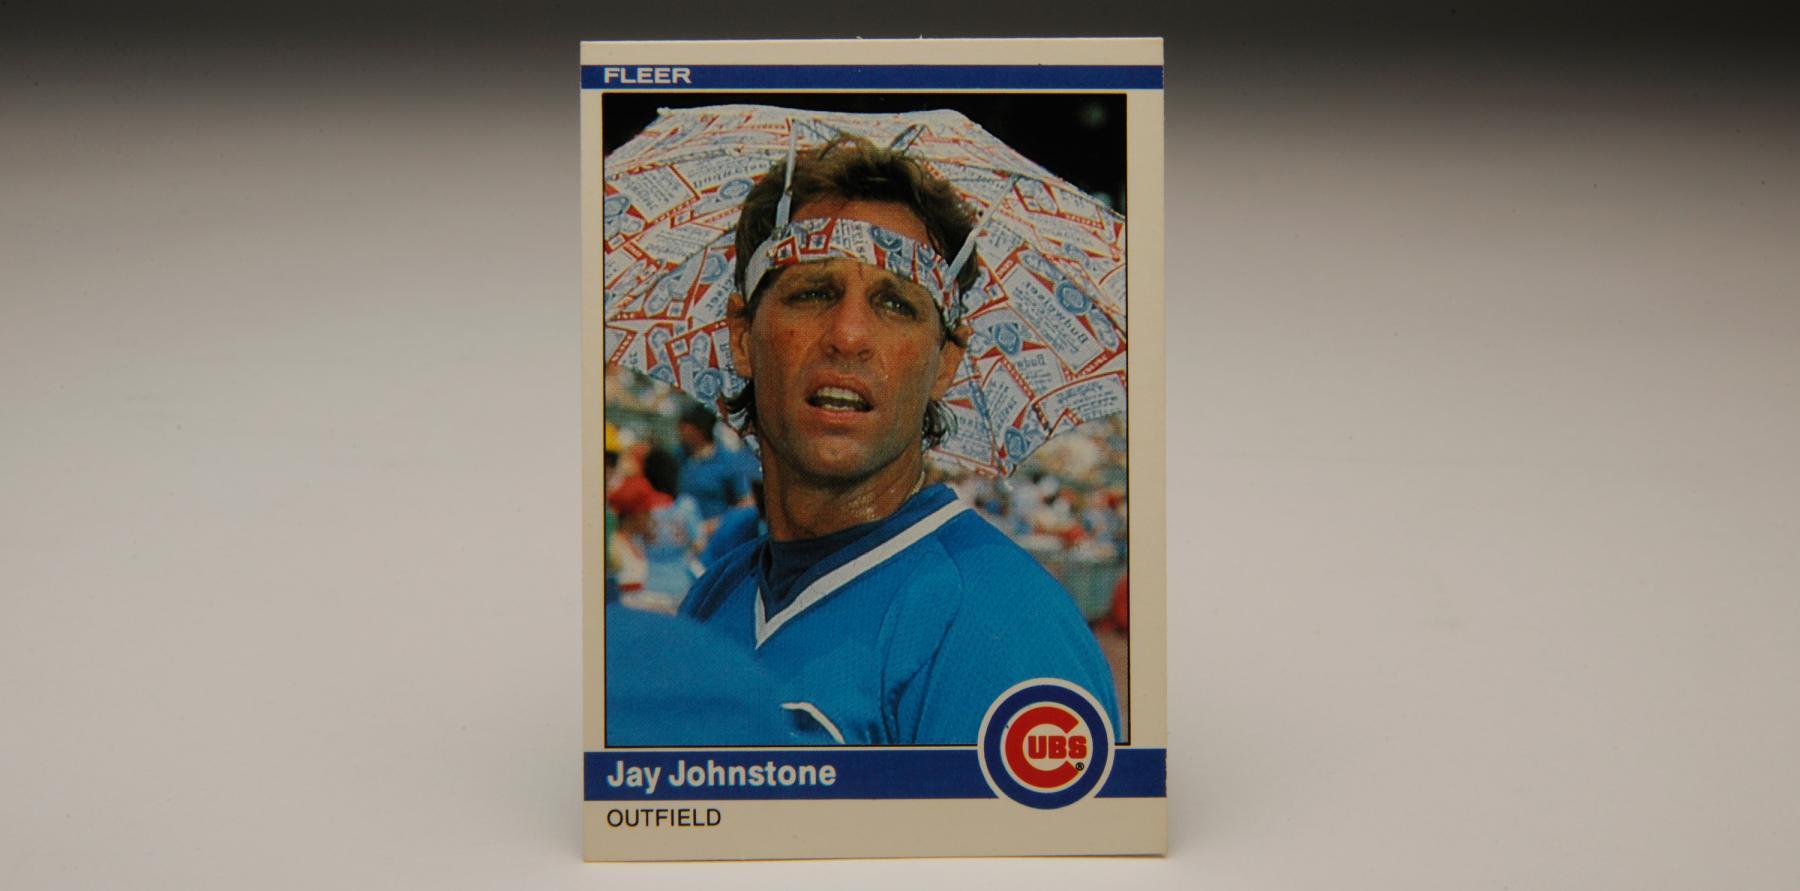 "Jay Johnstone 1984 Fleer ""Brockabrella"" card. B-49.47 (Milo Stewart, Jr. / National Baseball Hall of Fame)"